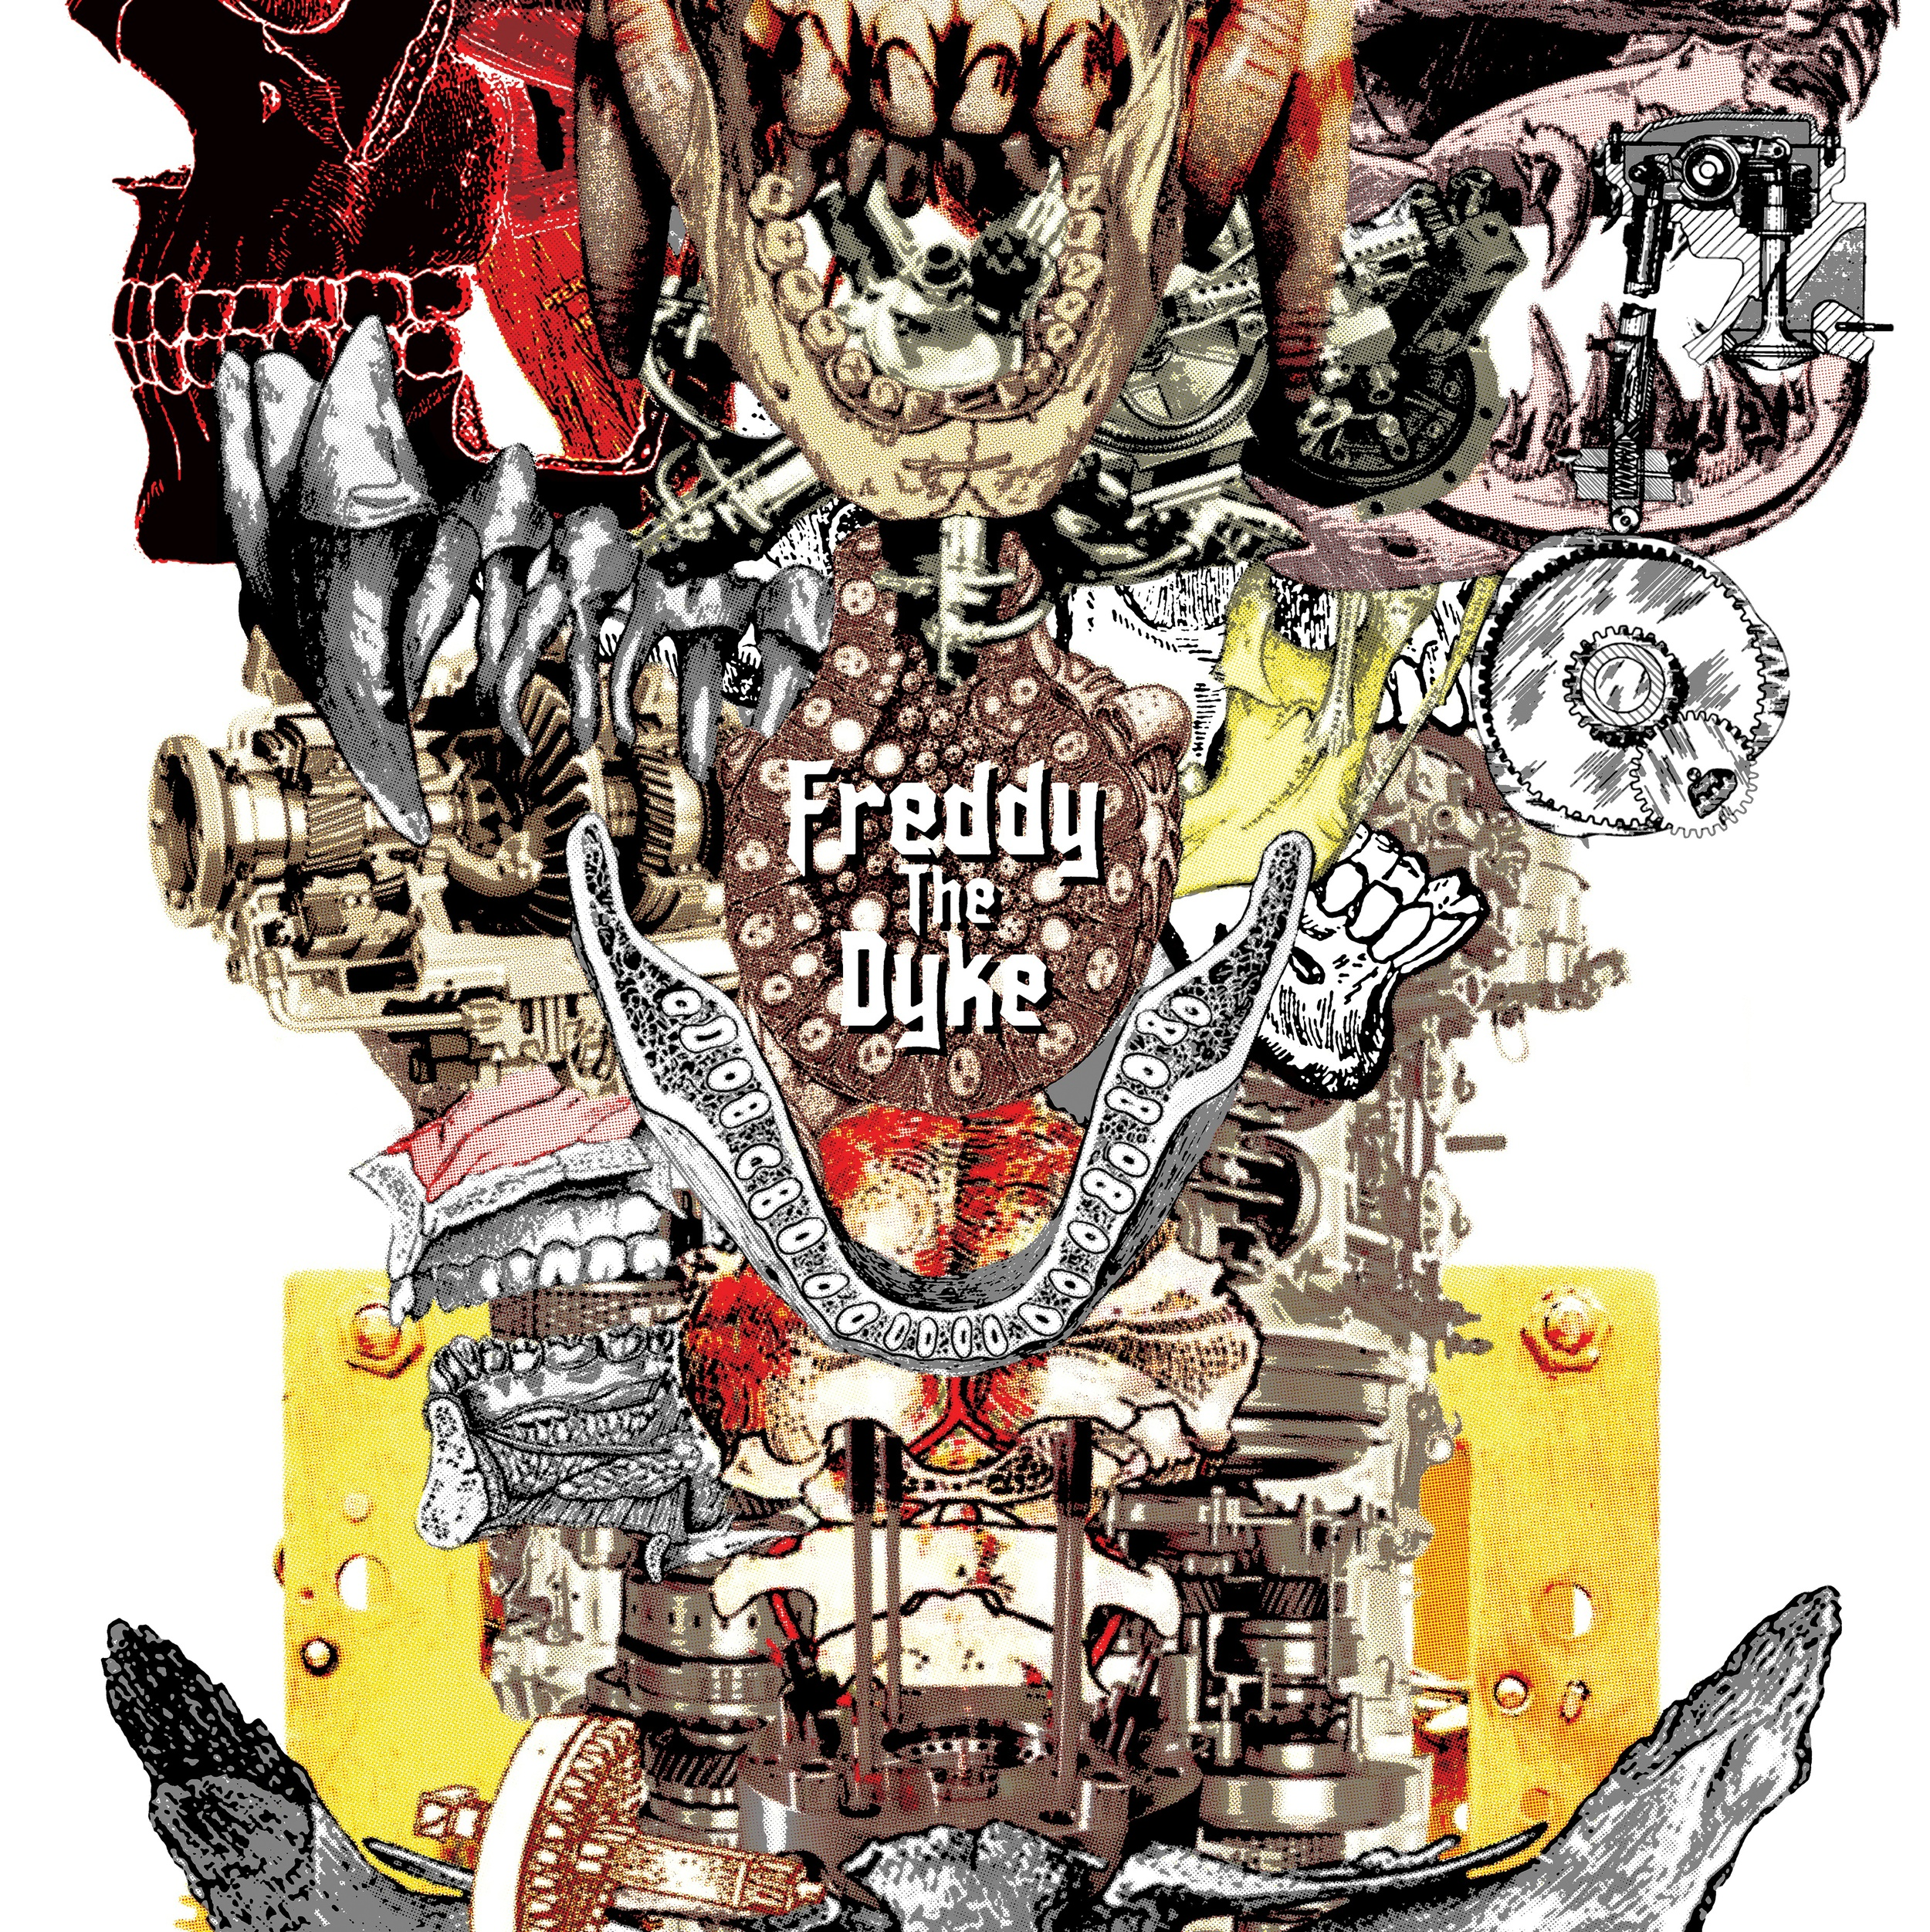 SKULP02 Freddy The Dyke LP Released 14.05.14 - 250 copies